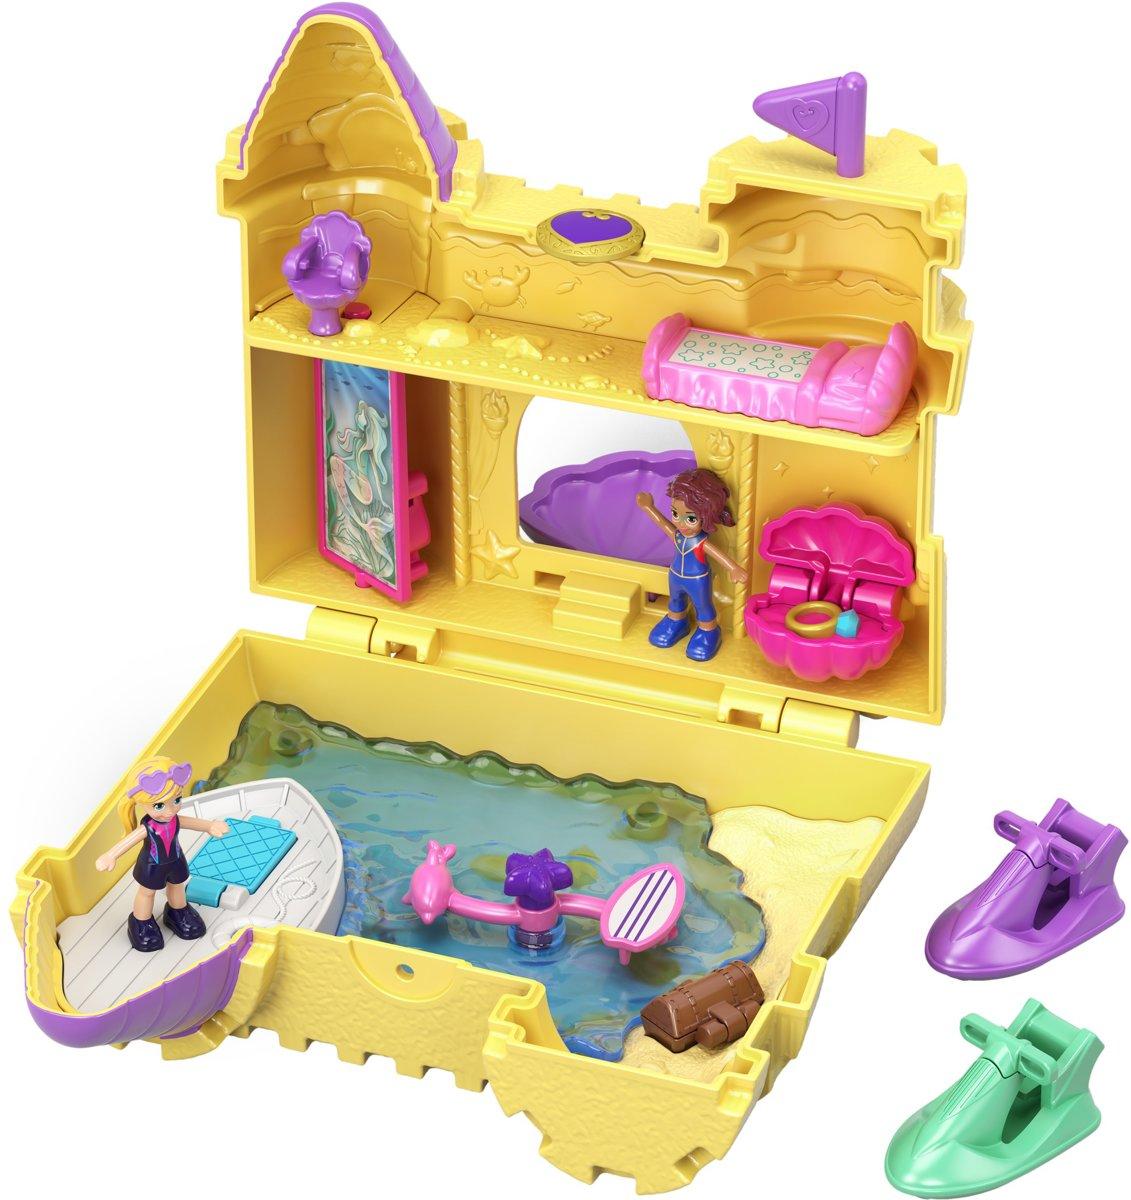 Polly Pocket Pocket World Zandkasteel - Speelfigurenset